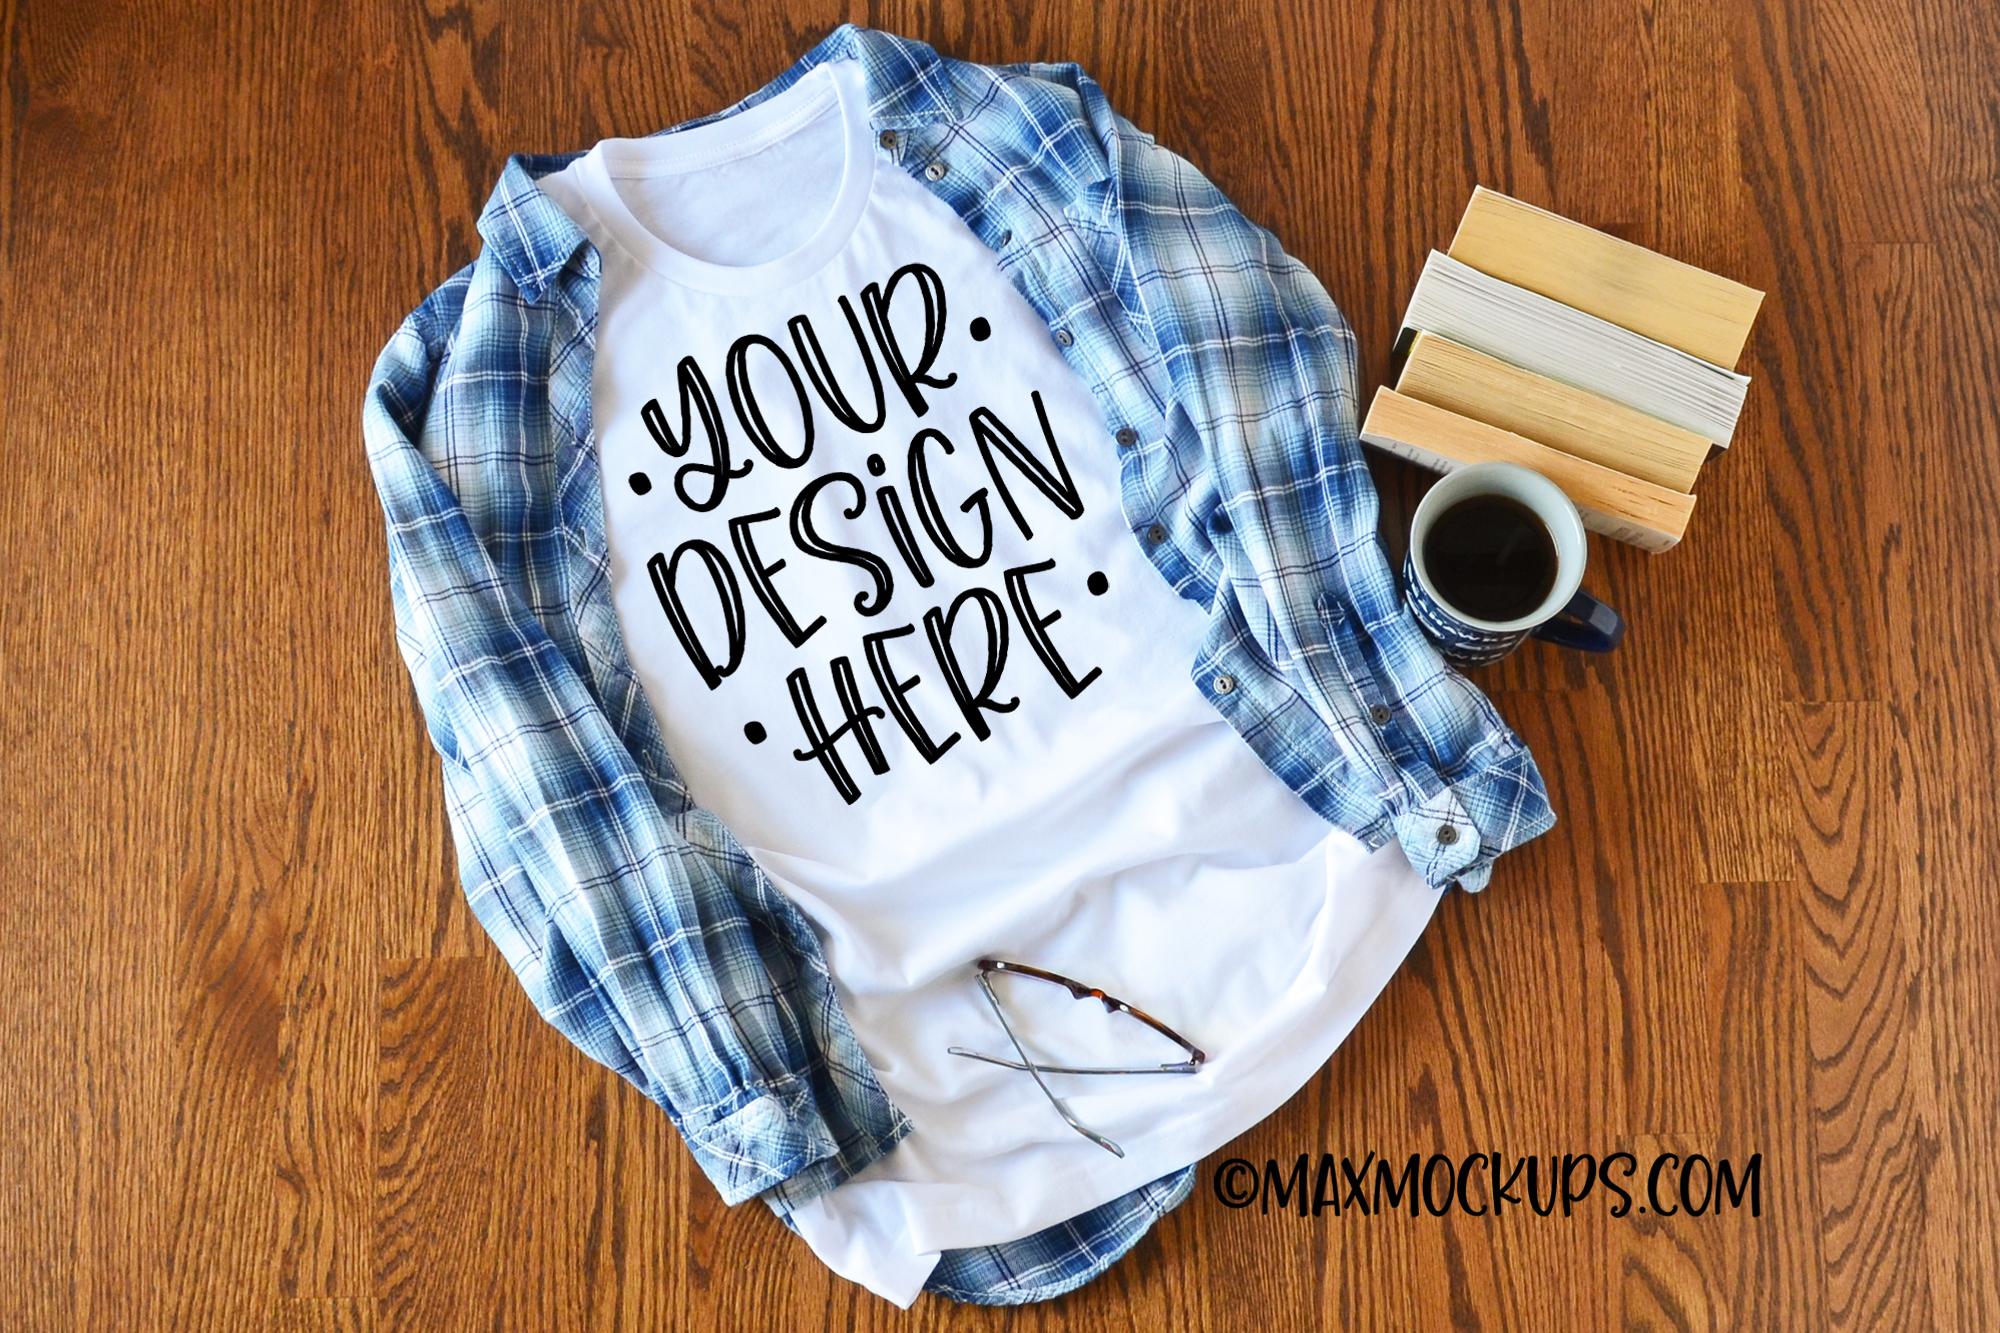 White t-shirt mockup Bella Canvas 3001, plaid, coffee, books example image 1